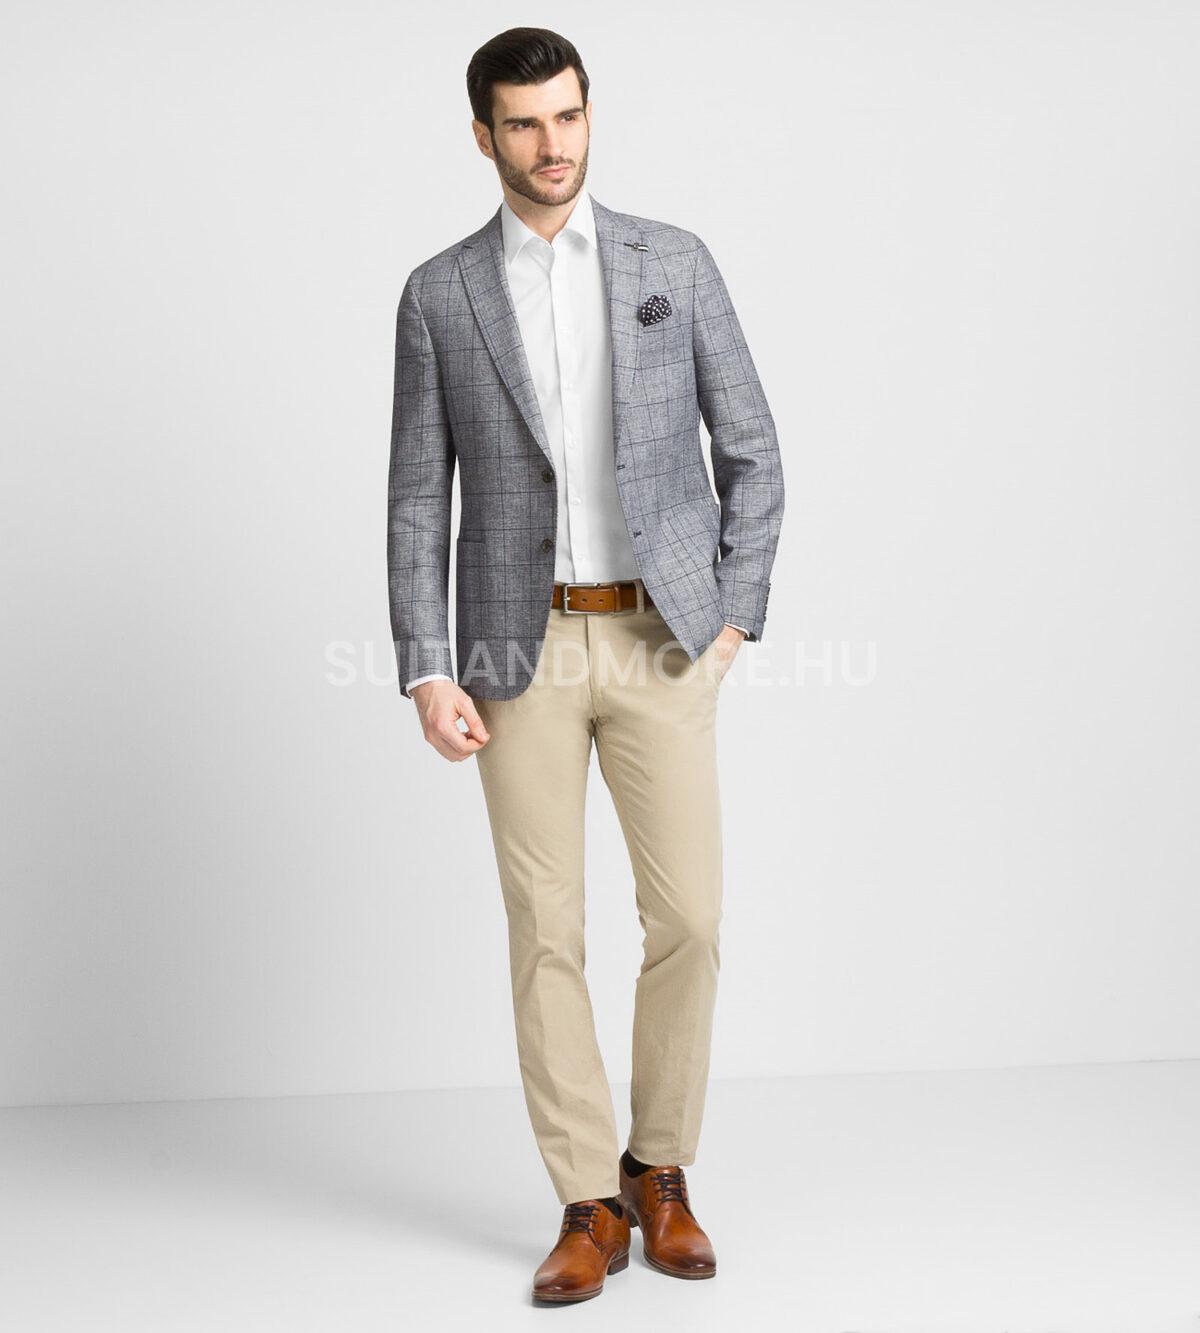 edward-modern-fit-casual-kek-kockas-zako-edward-1172399-27-12